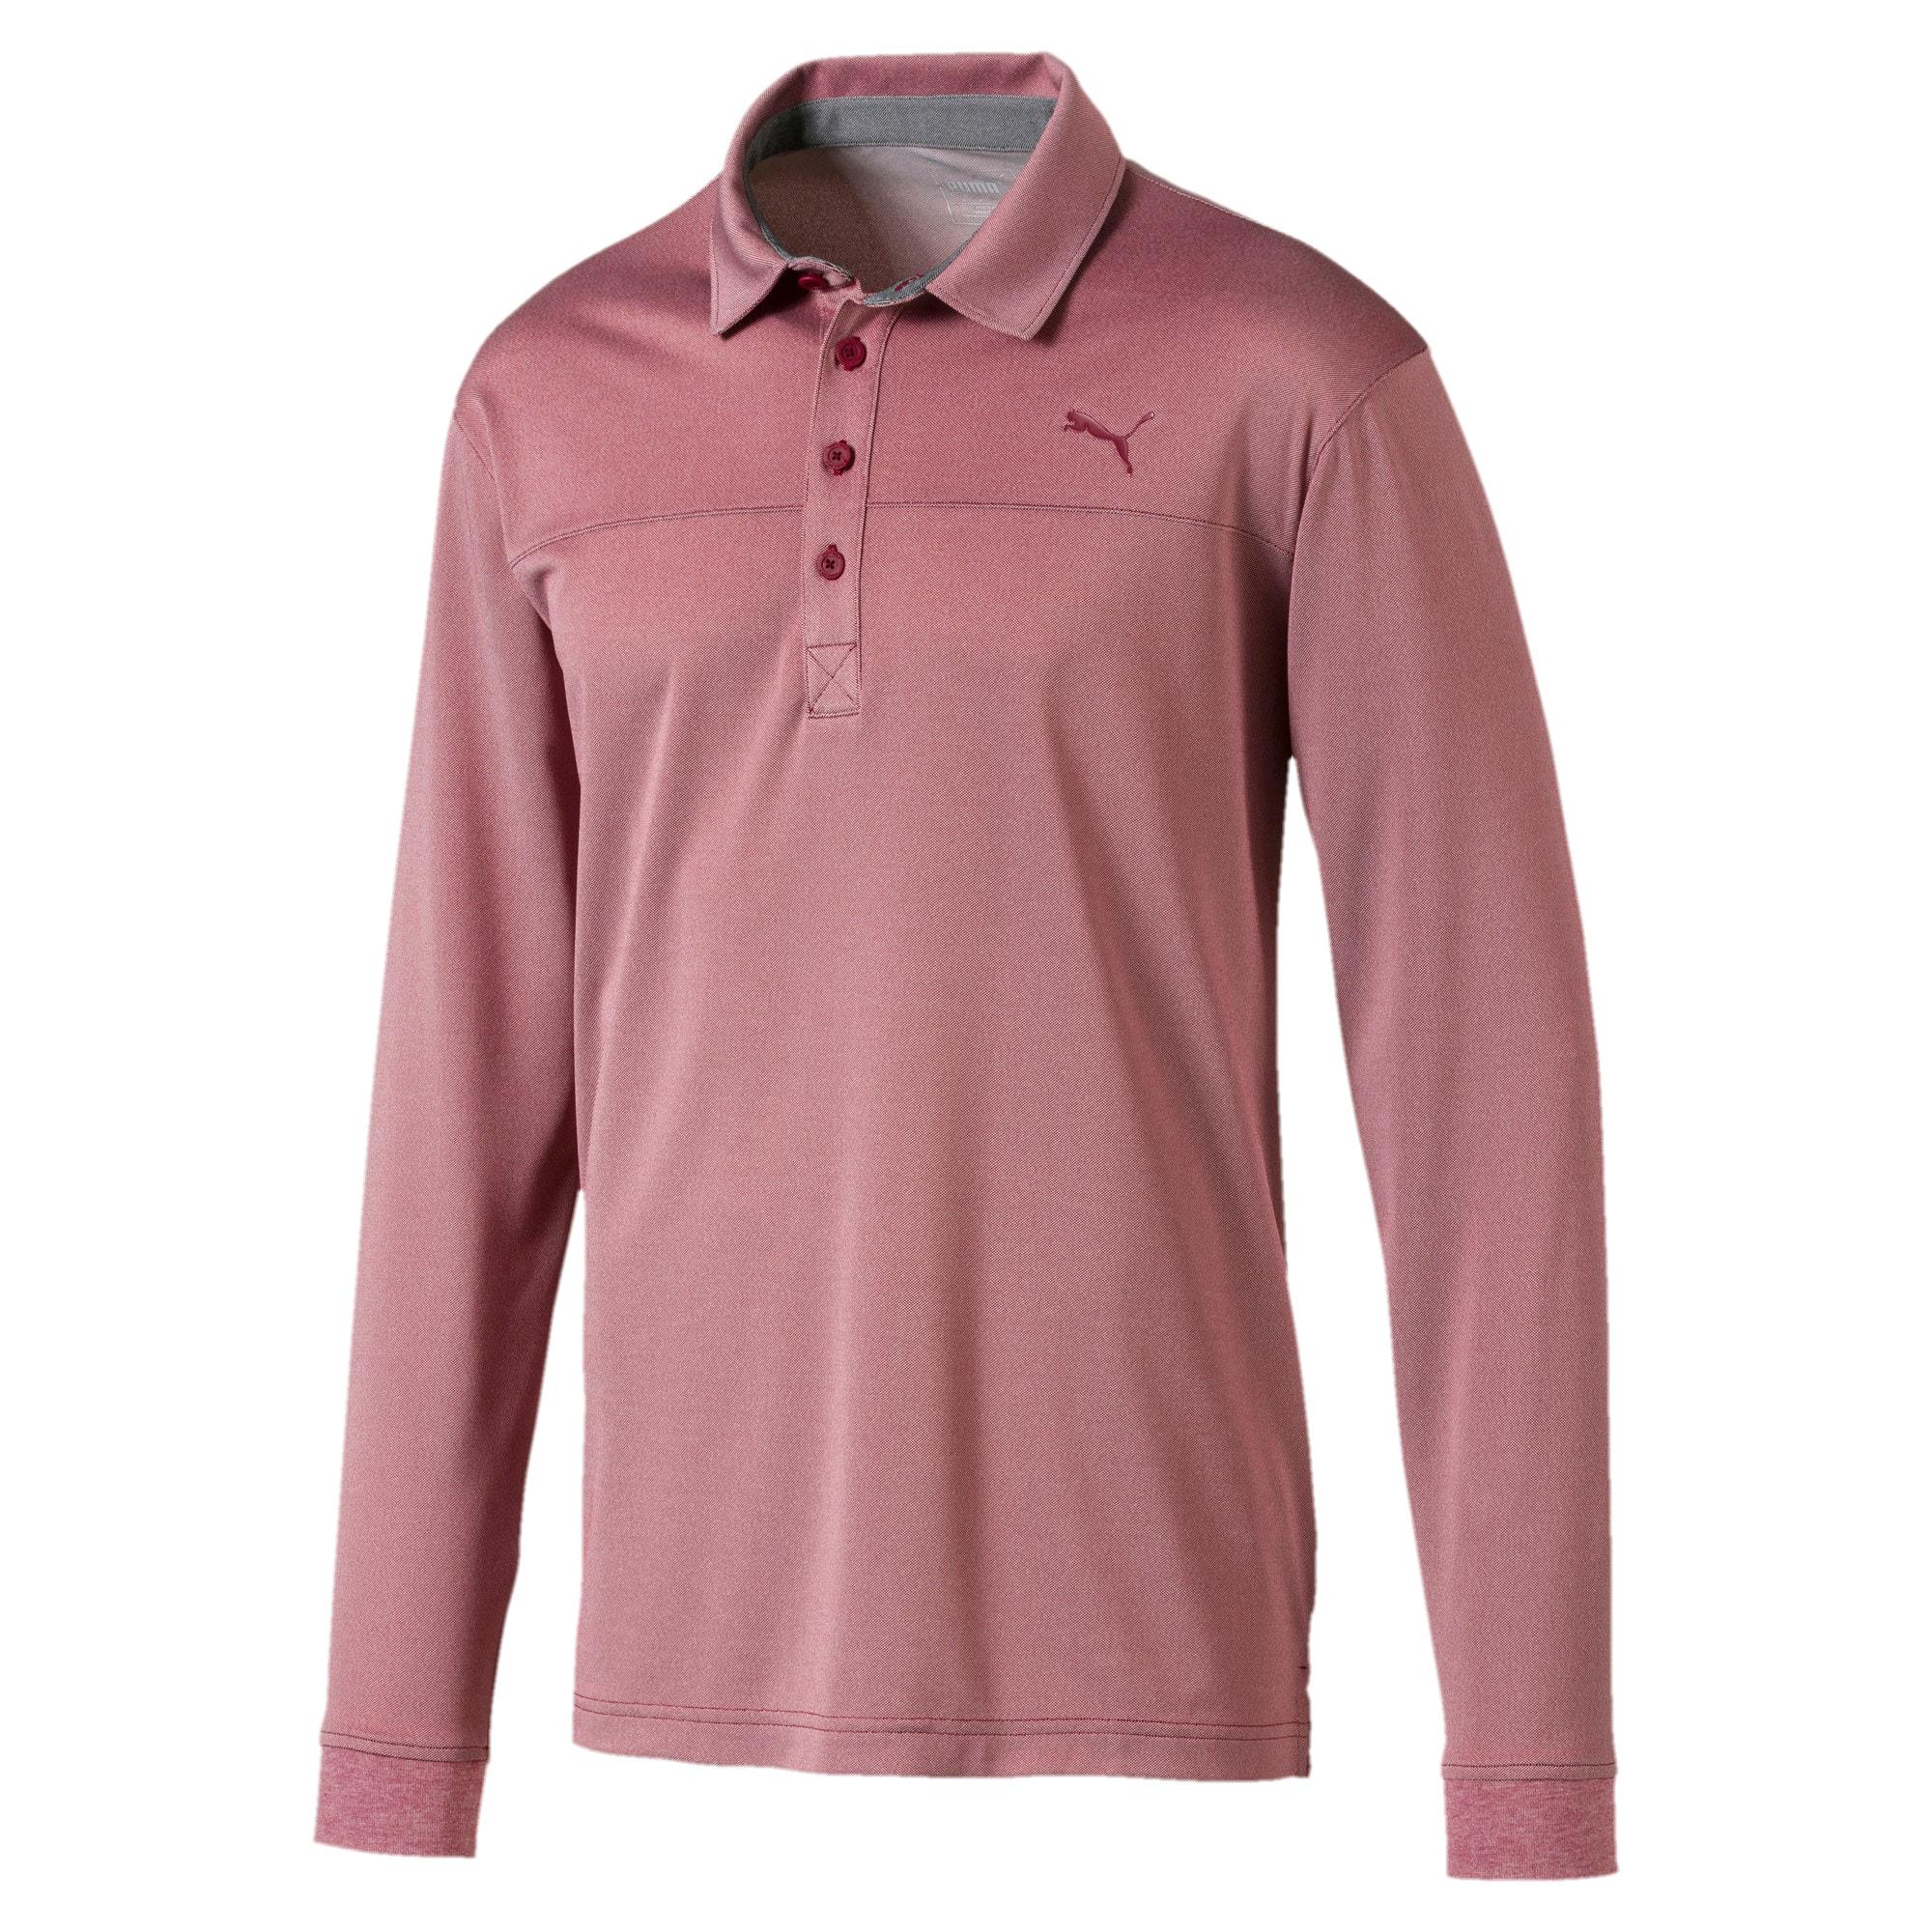 Thumbnail 4 of Long Sleeve Men's Golf Polo, Rhubarb Heather, medium